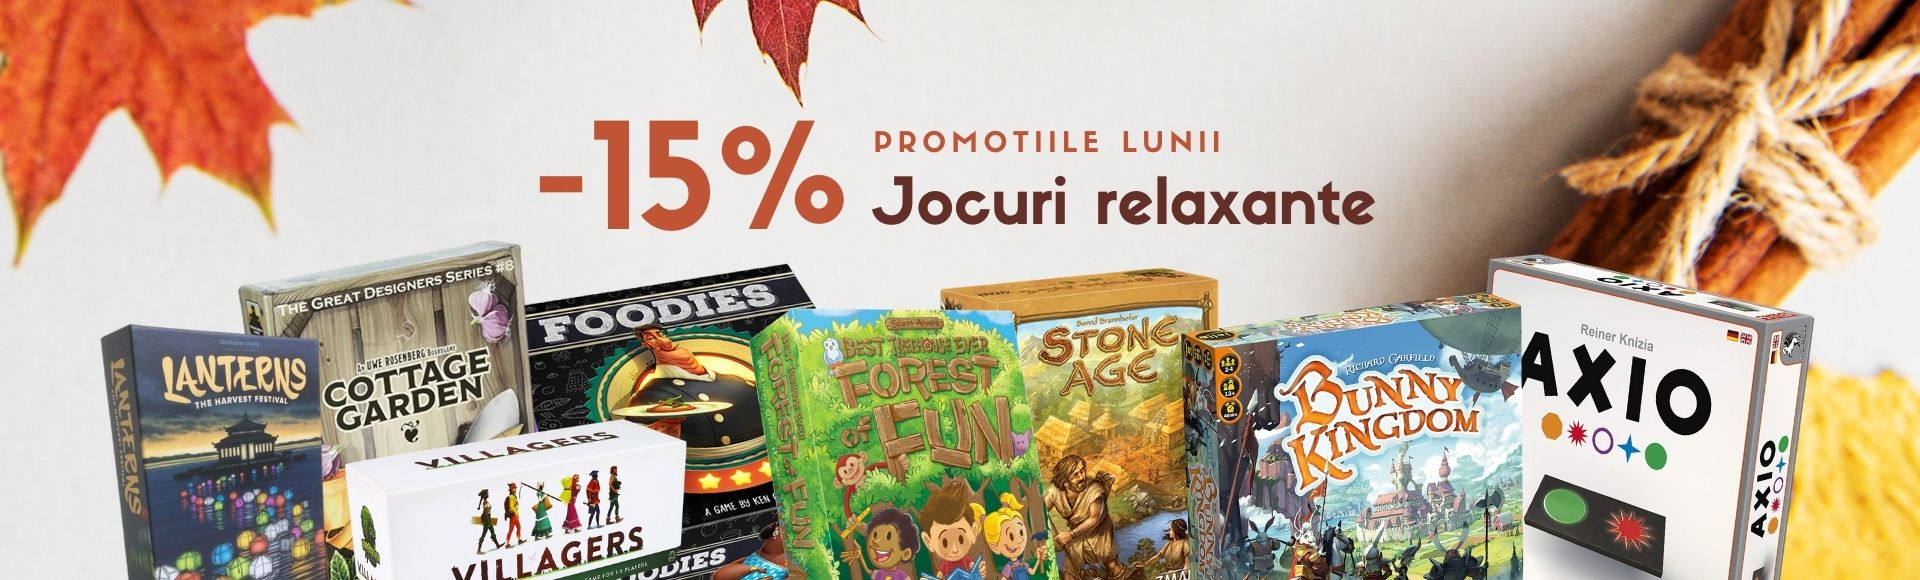 Jocuri relaxante -15%